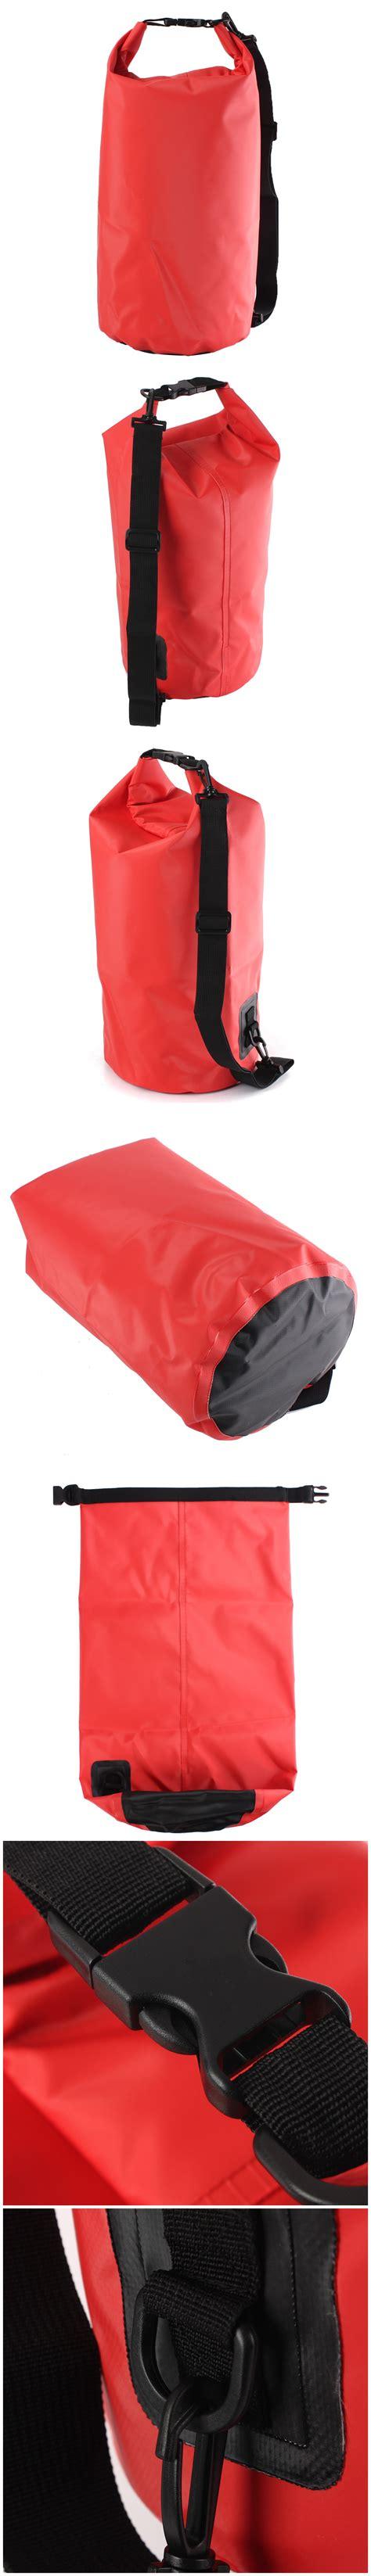 Wvd1 Bag Waterproof Bag 15l 15l waterproof bag sack for cing hiking canoe kayak swim rafting alex nld